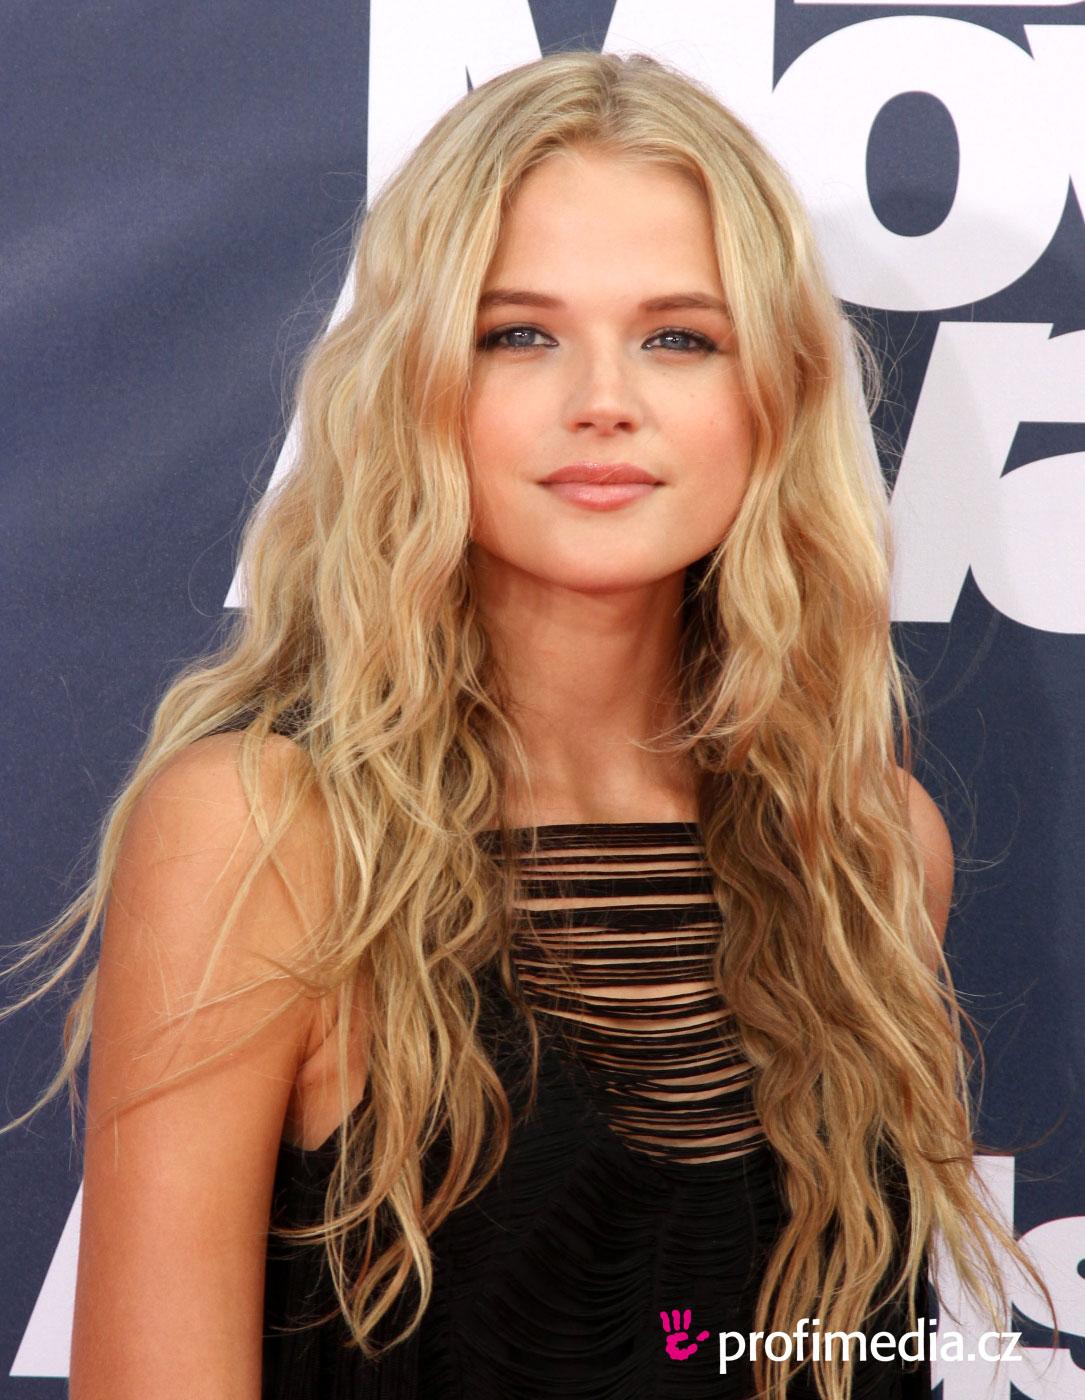 Movie actress Gabriella Wilde - age: 28